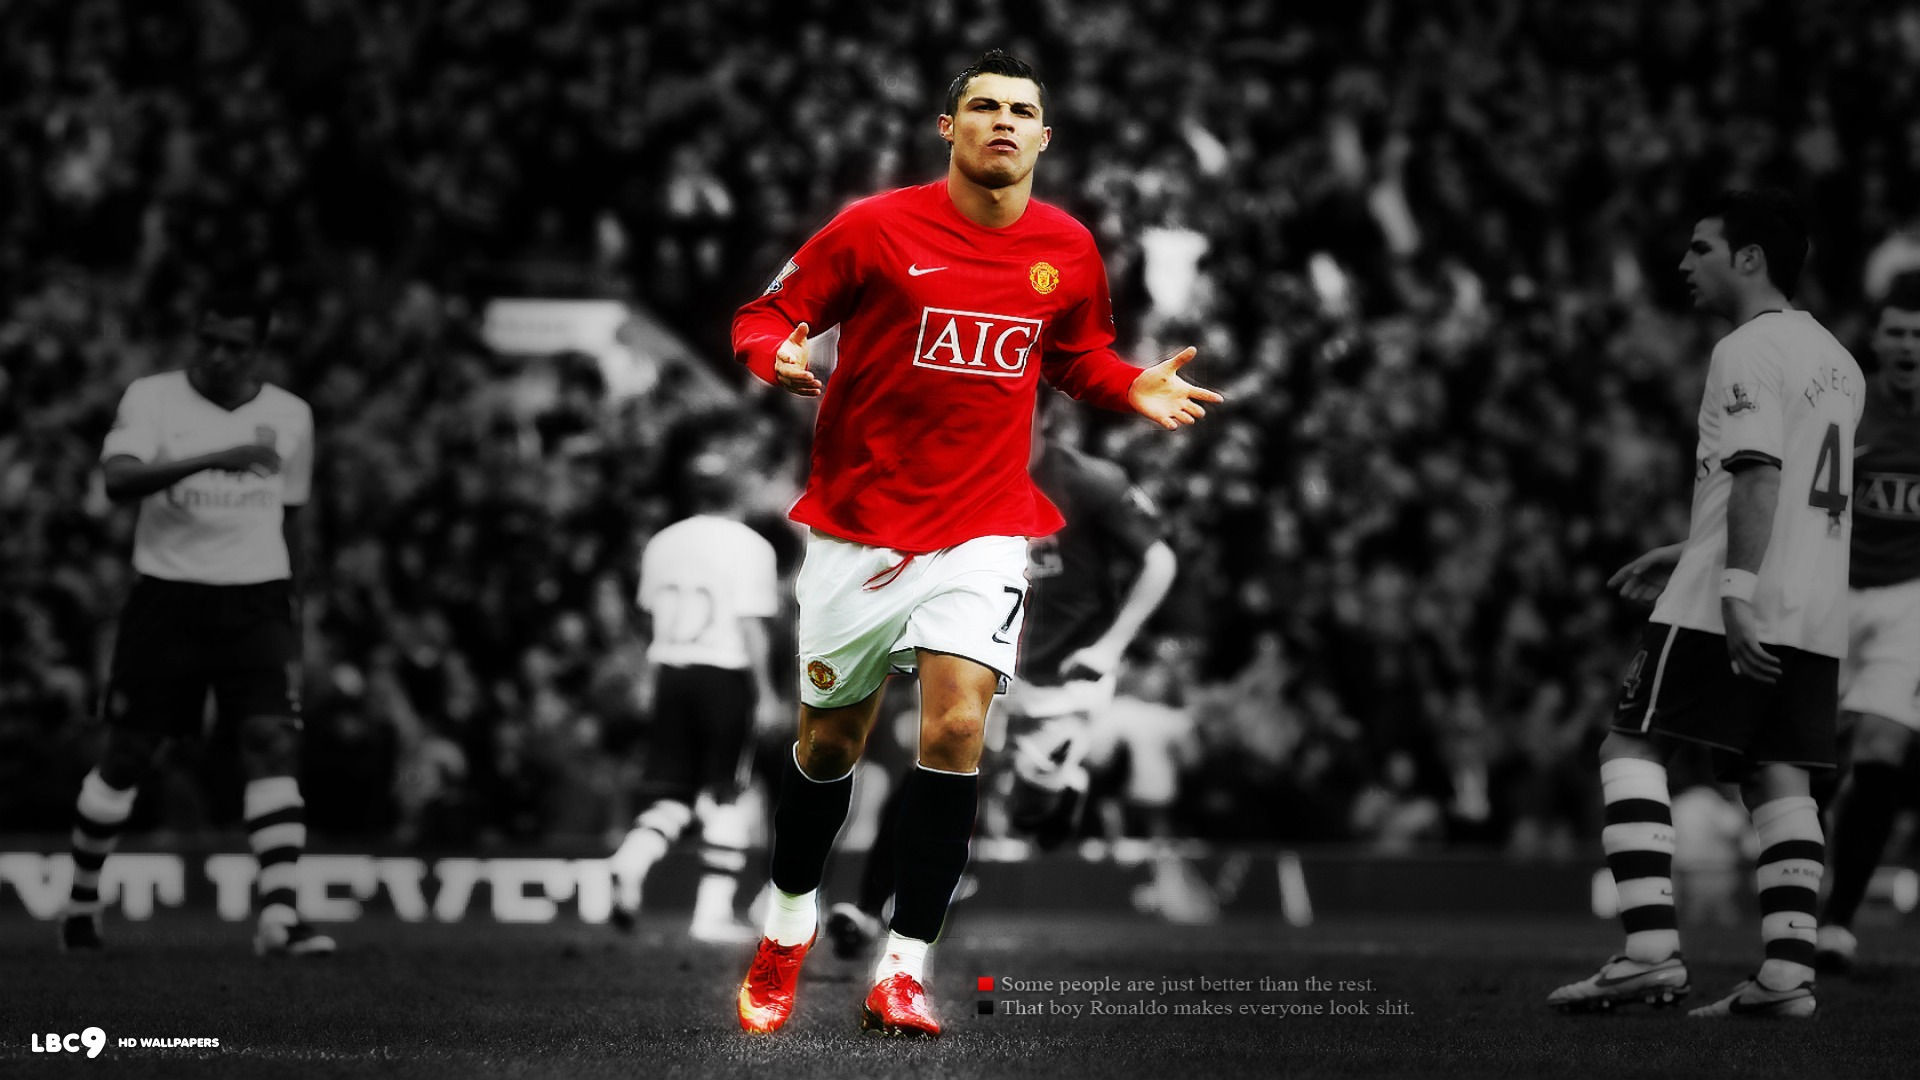 Cristiano Ronaldo Wallpaper 1080p (74+ Images